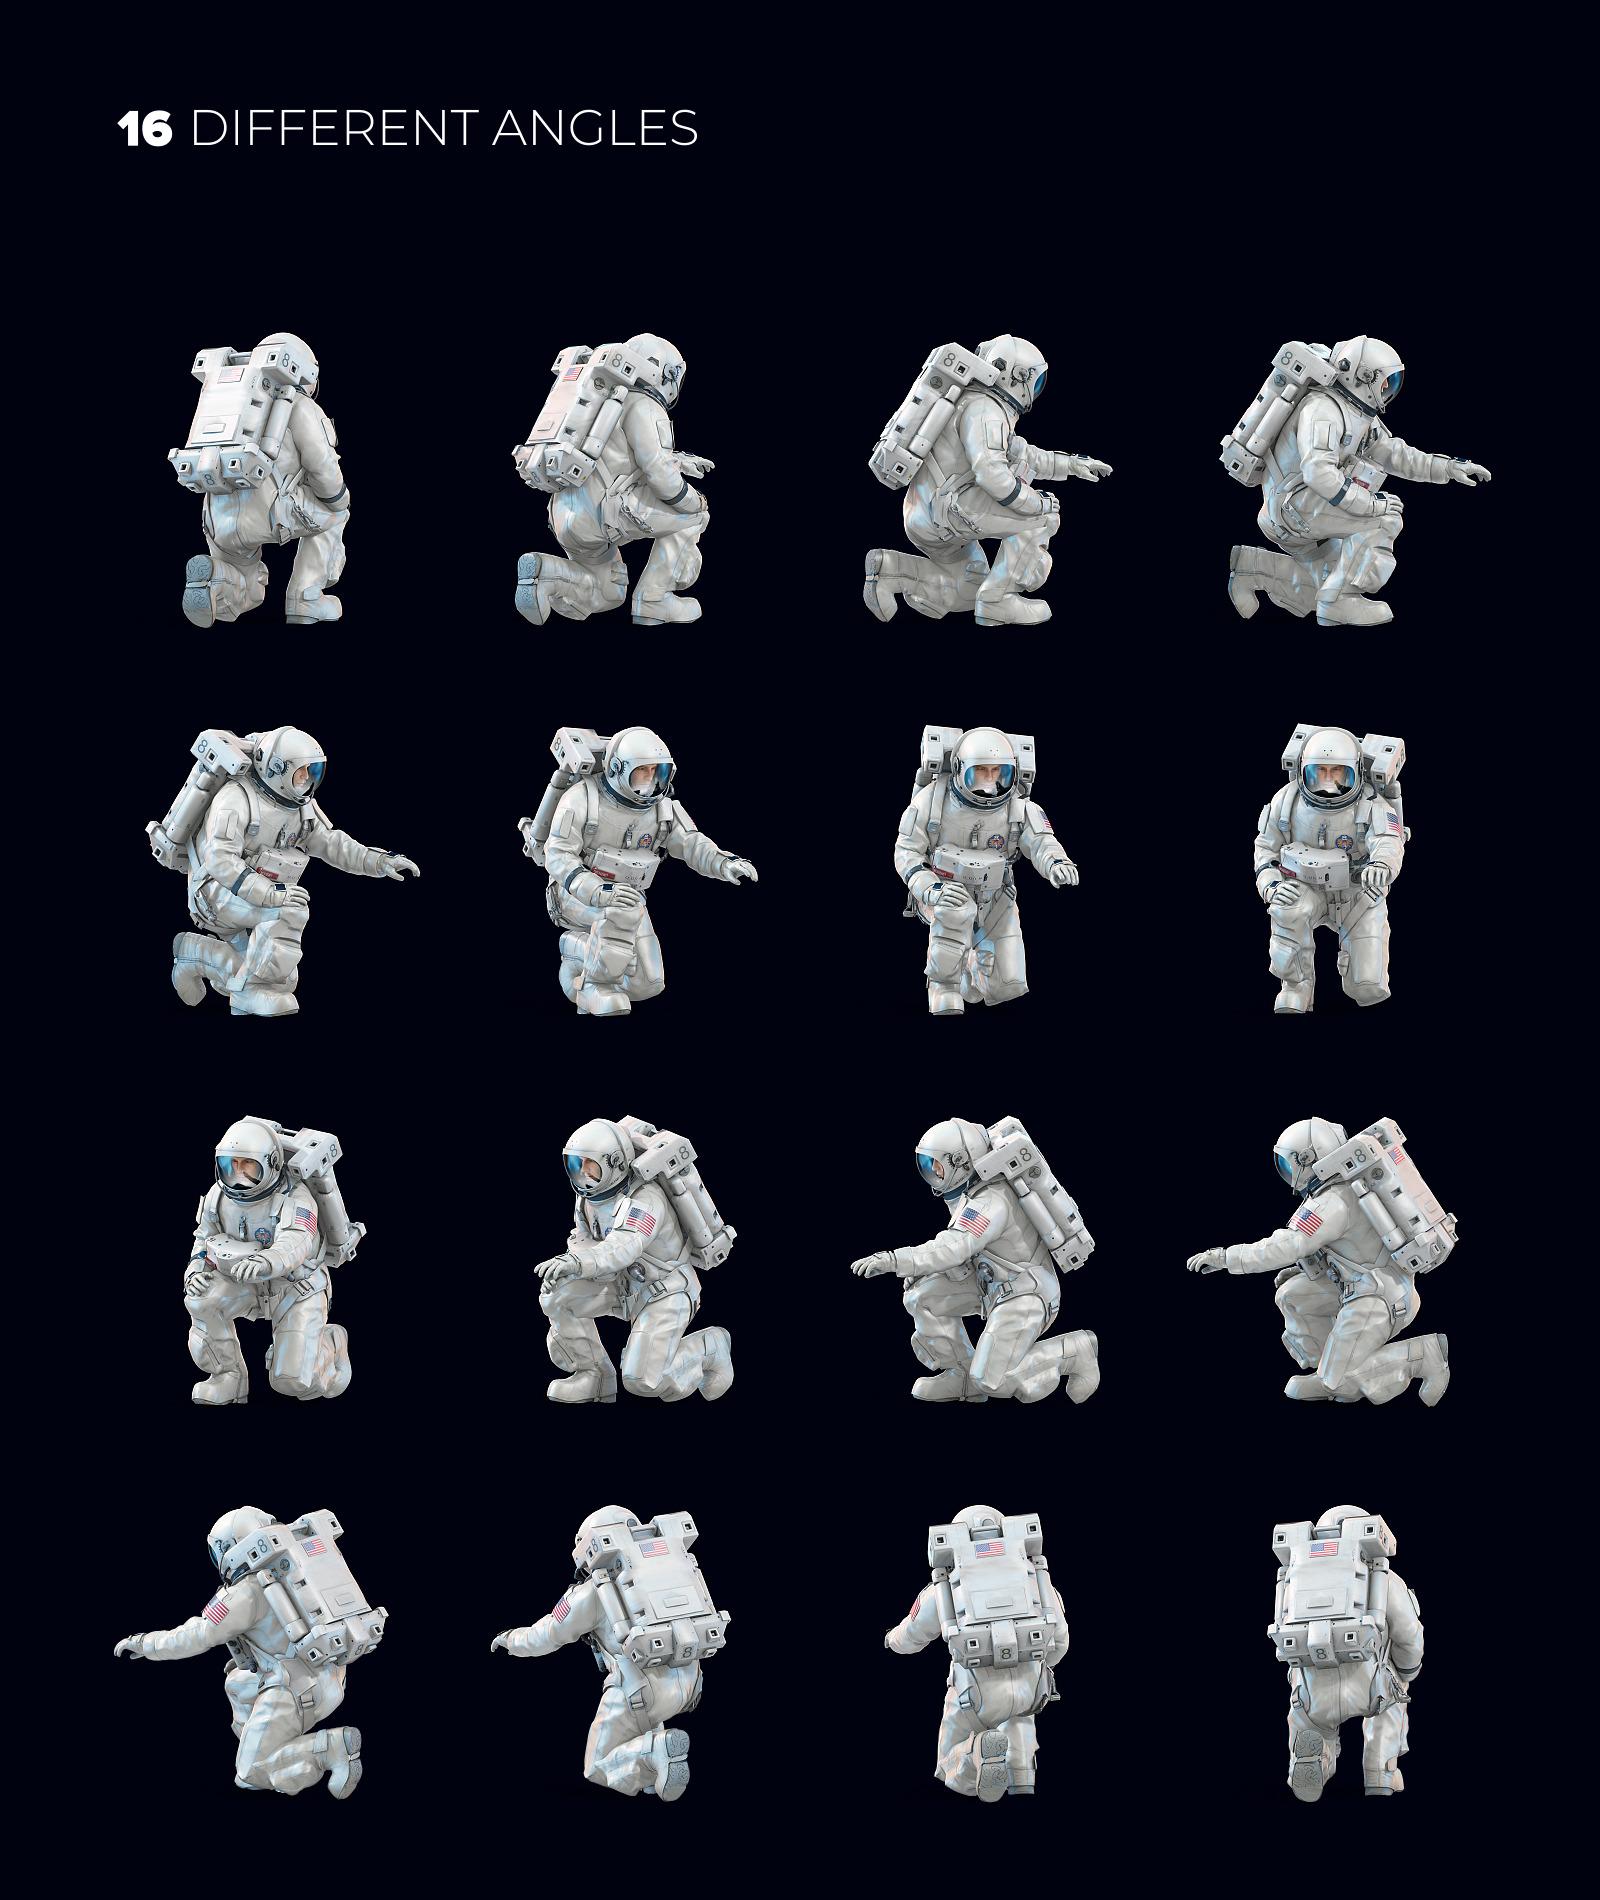 3D Mockup Space Astronaut #31